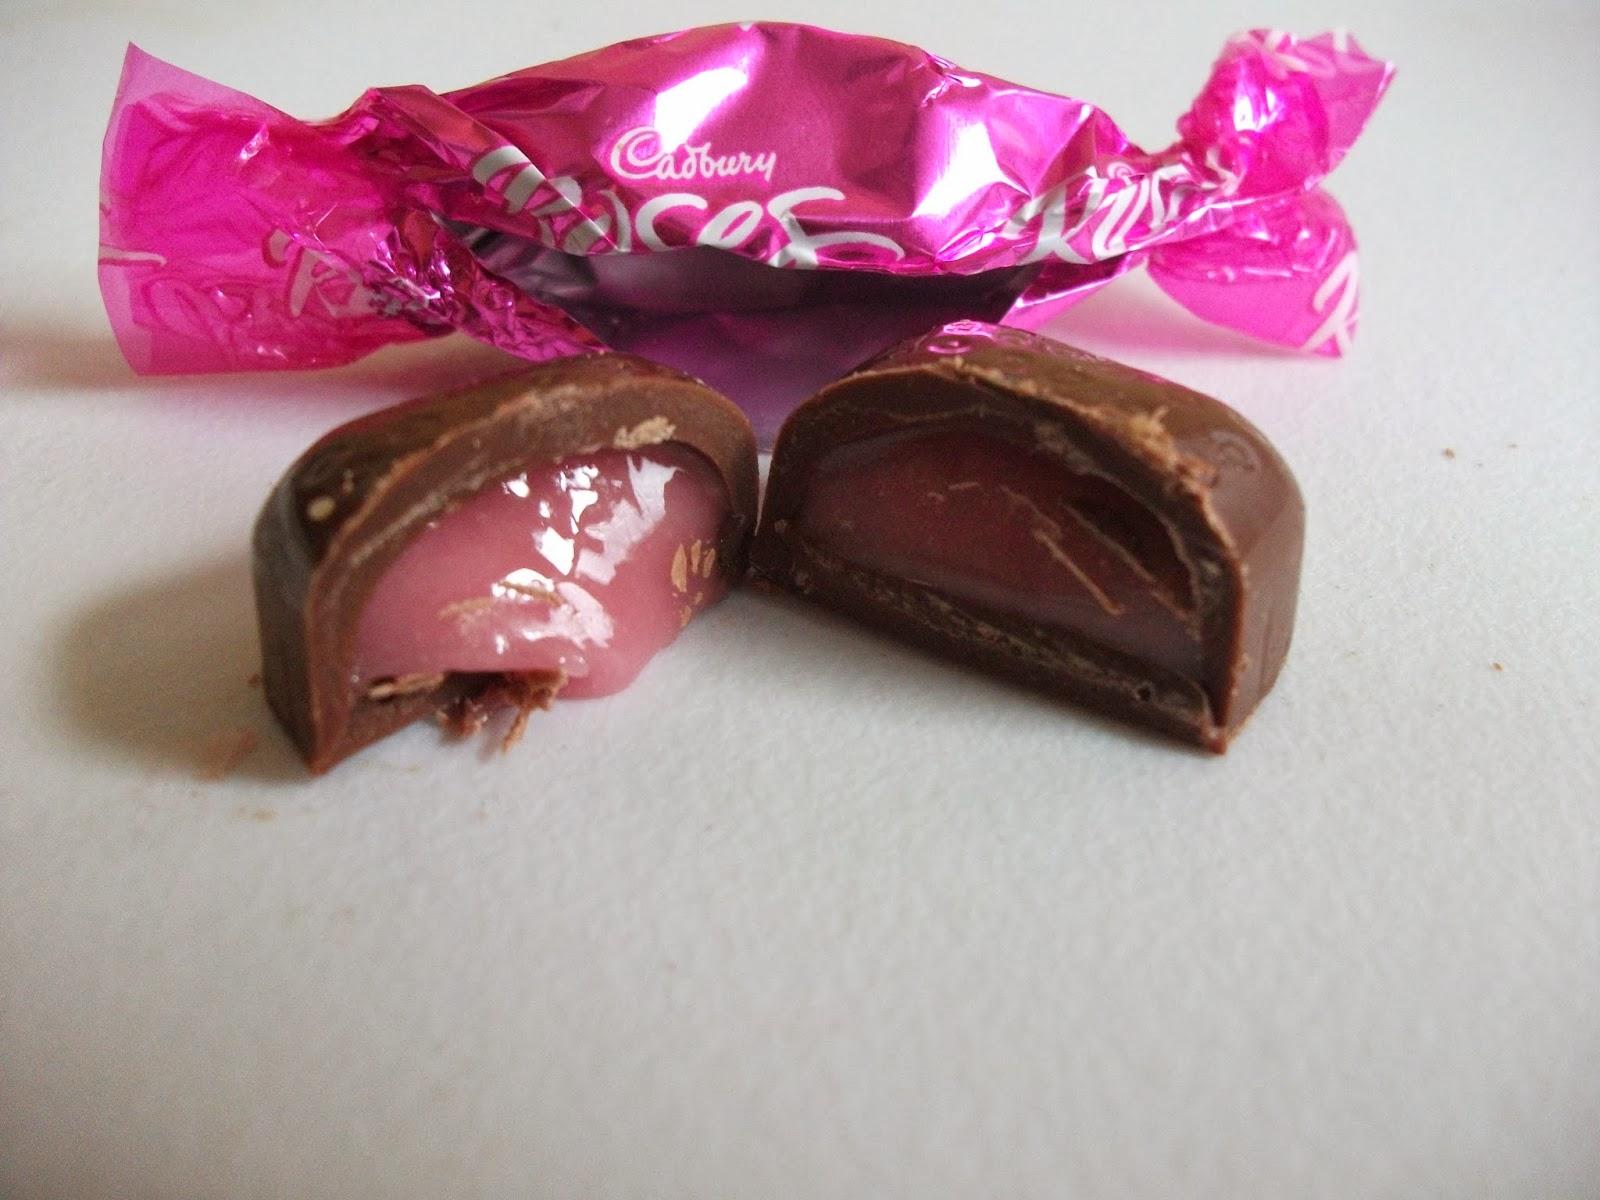 http://2.bp.blogspot.com/-PPDrG1bTESM/UoFNjrD8PKI/AAAAAAAAFMM/lRbDASr7IsA/s1600/cadbury+roses+strawberry+dream.JPG